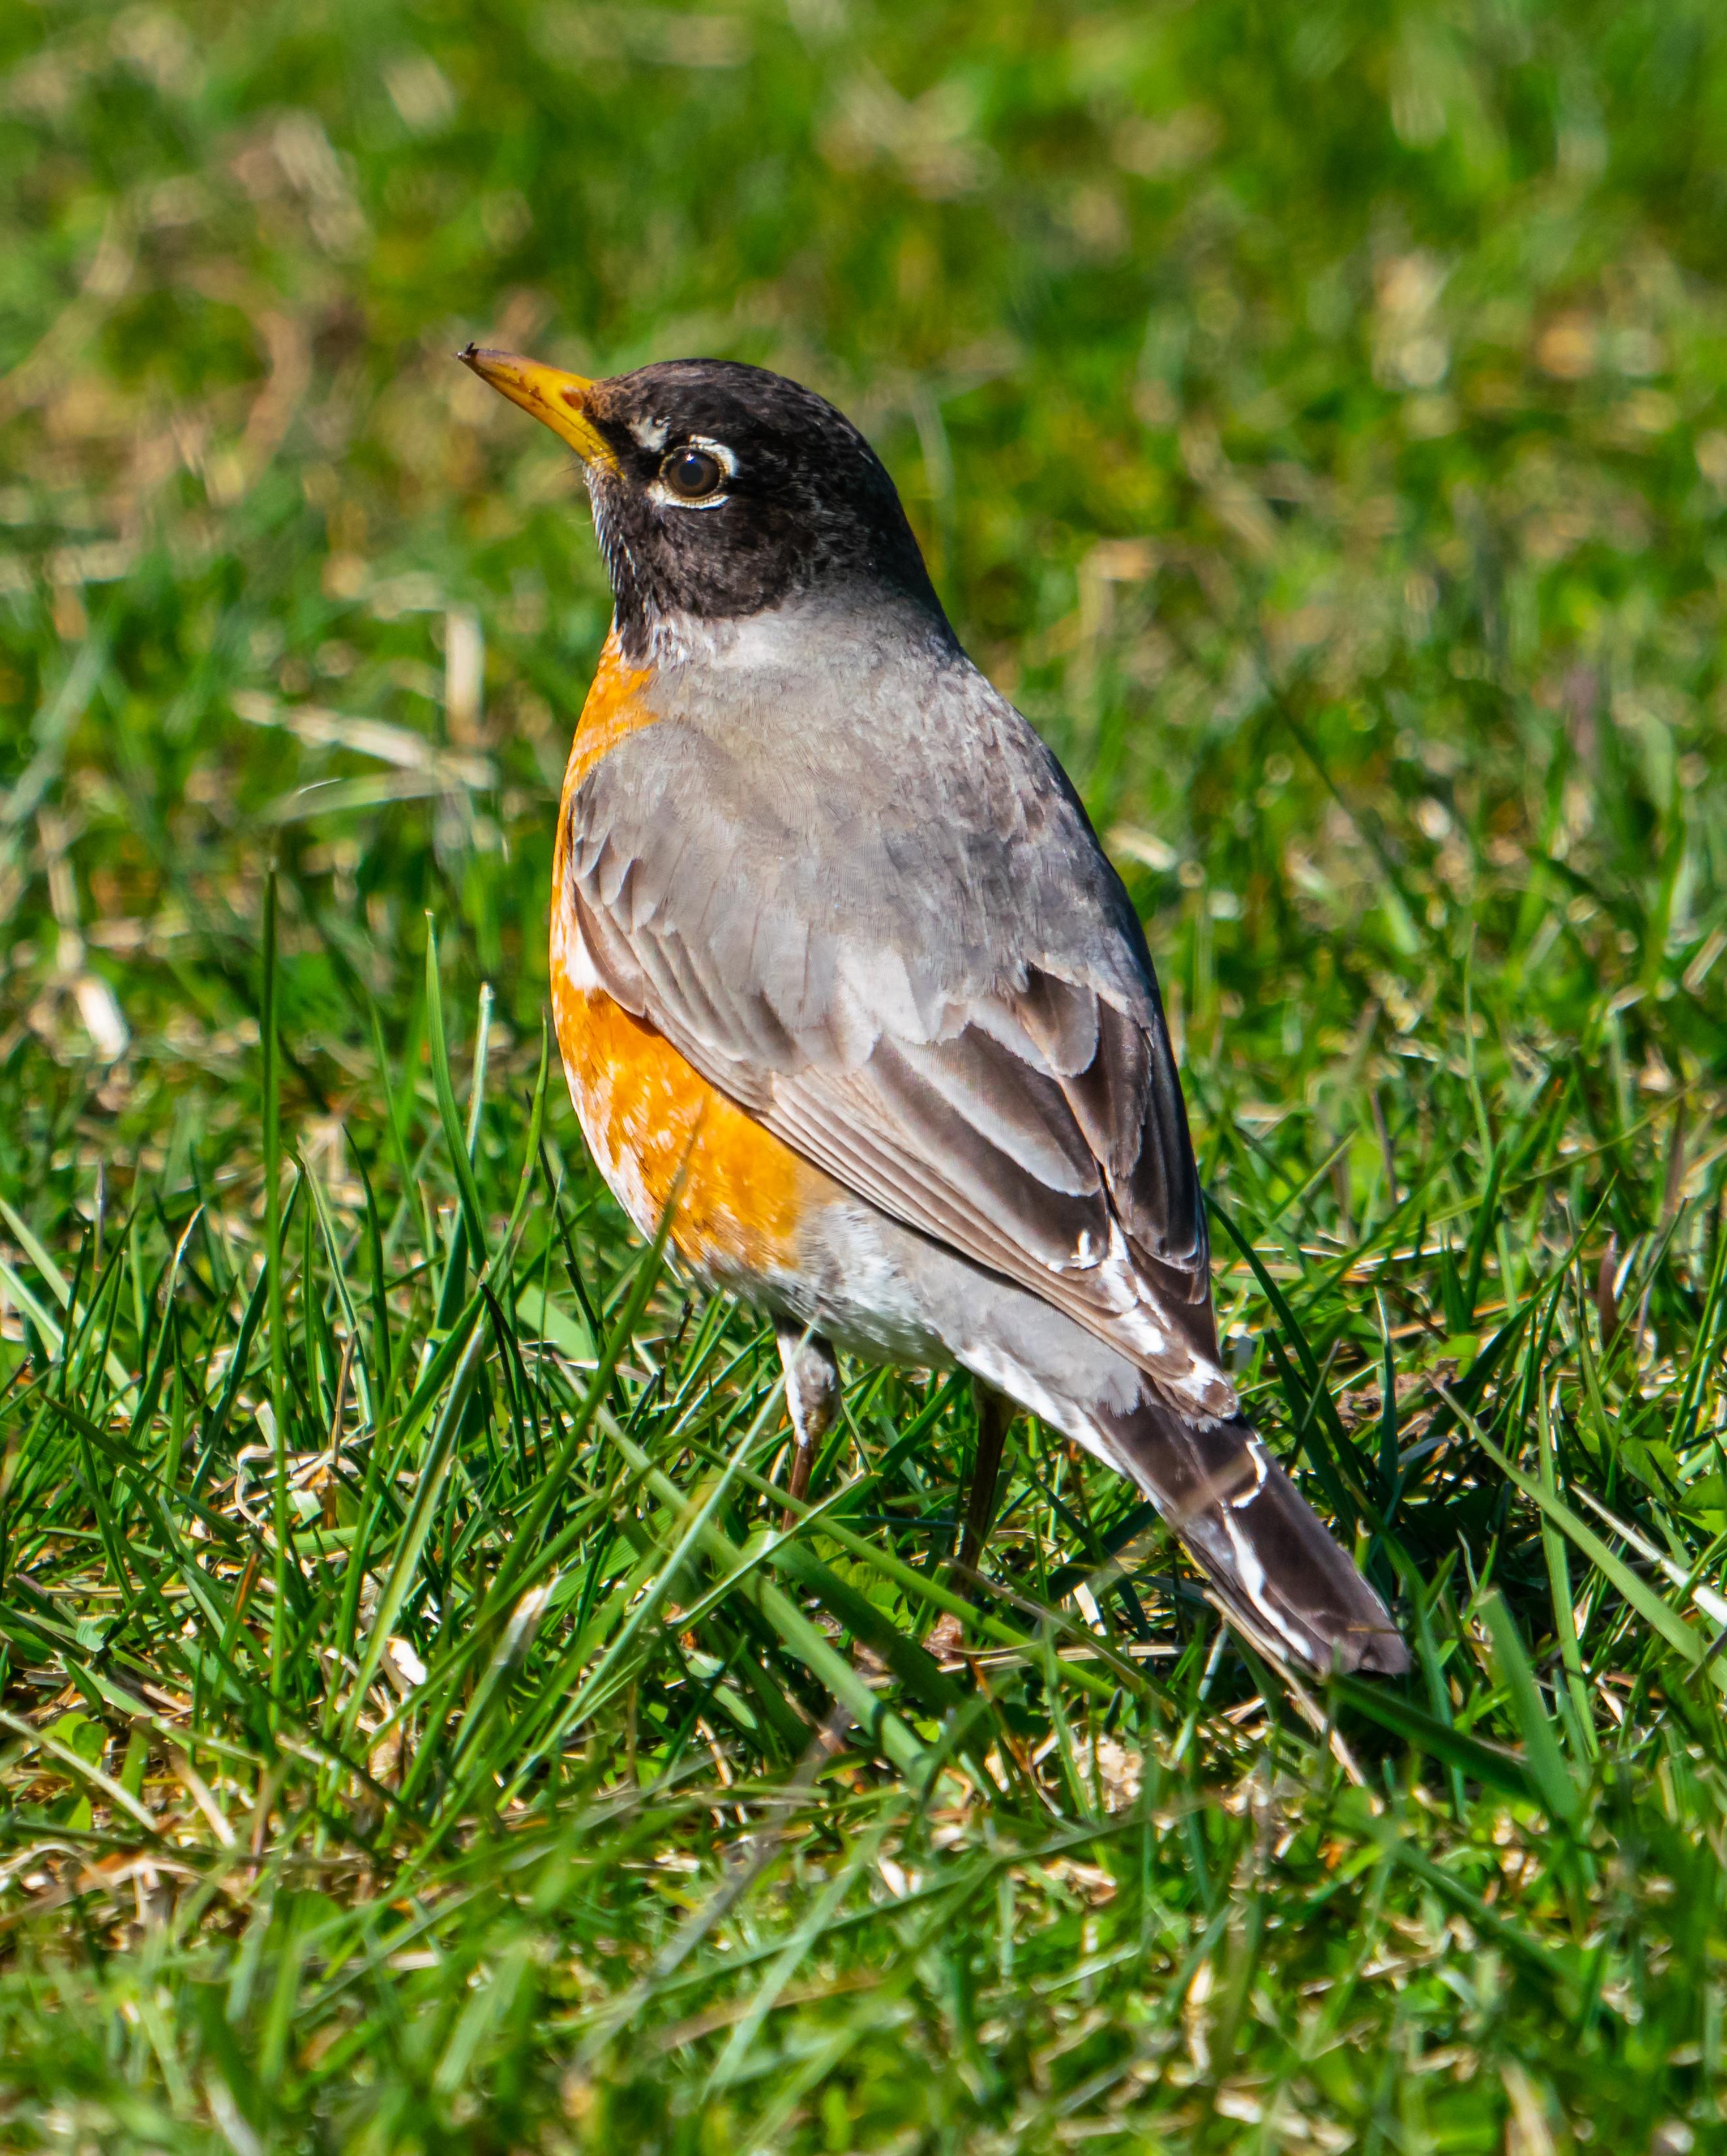 Robin in sunlight on springtime lawn.